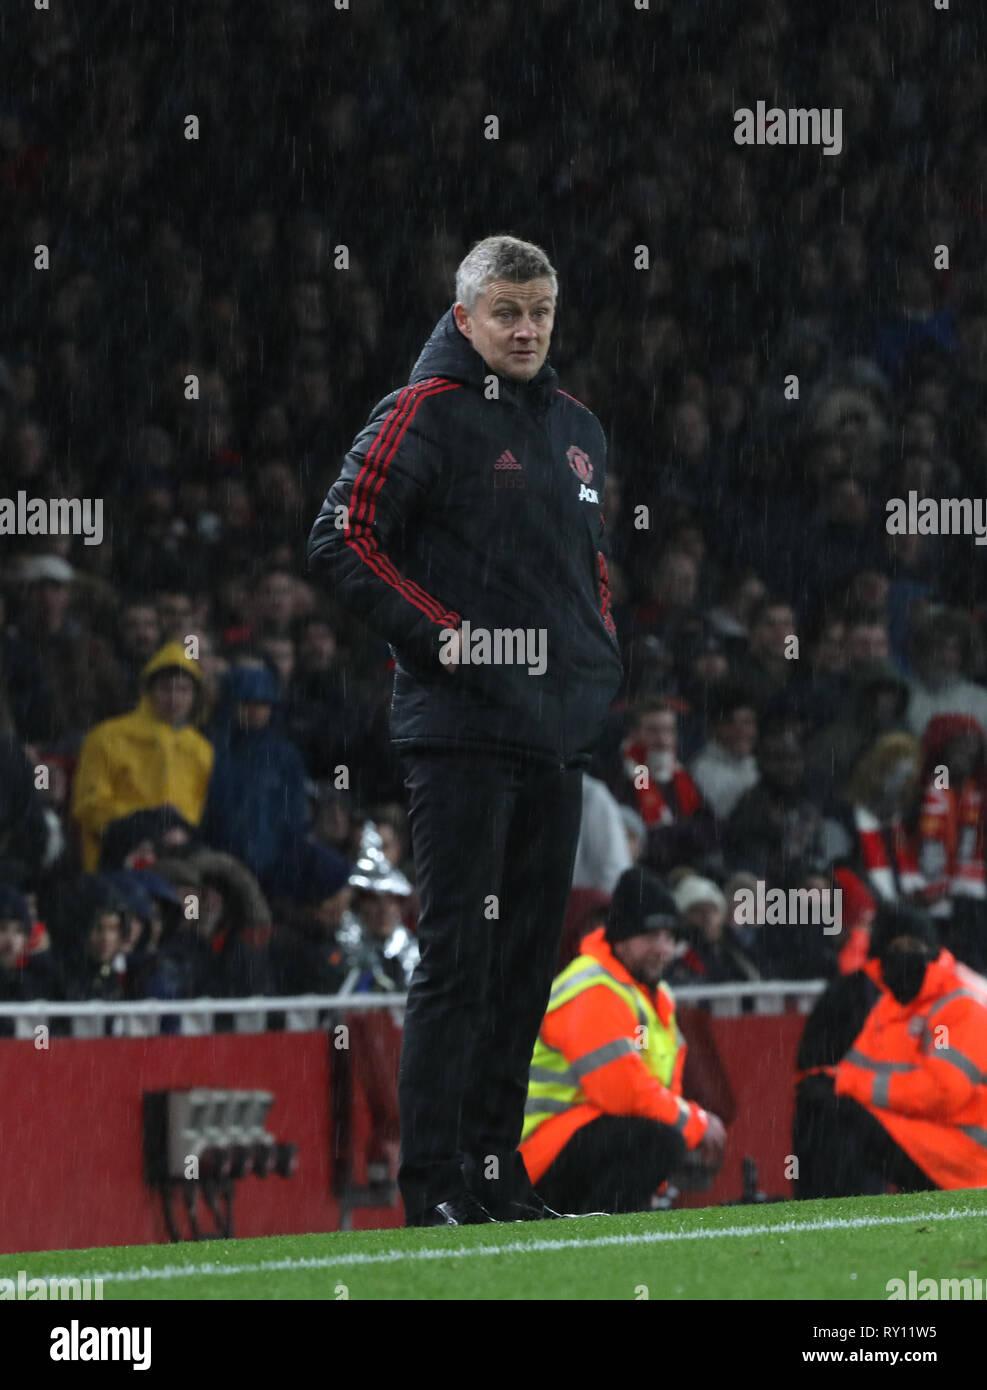 Man Utd Stock Photos & Man Utd Stock Images - Alamy